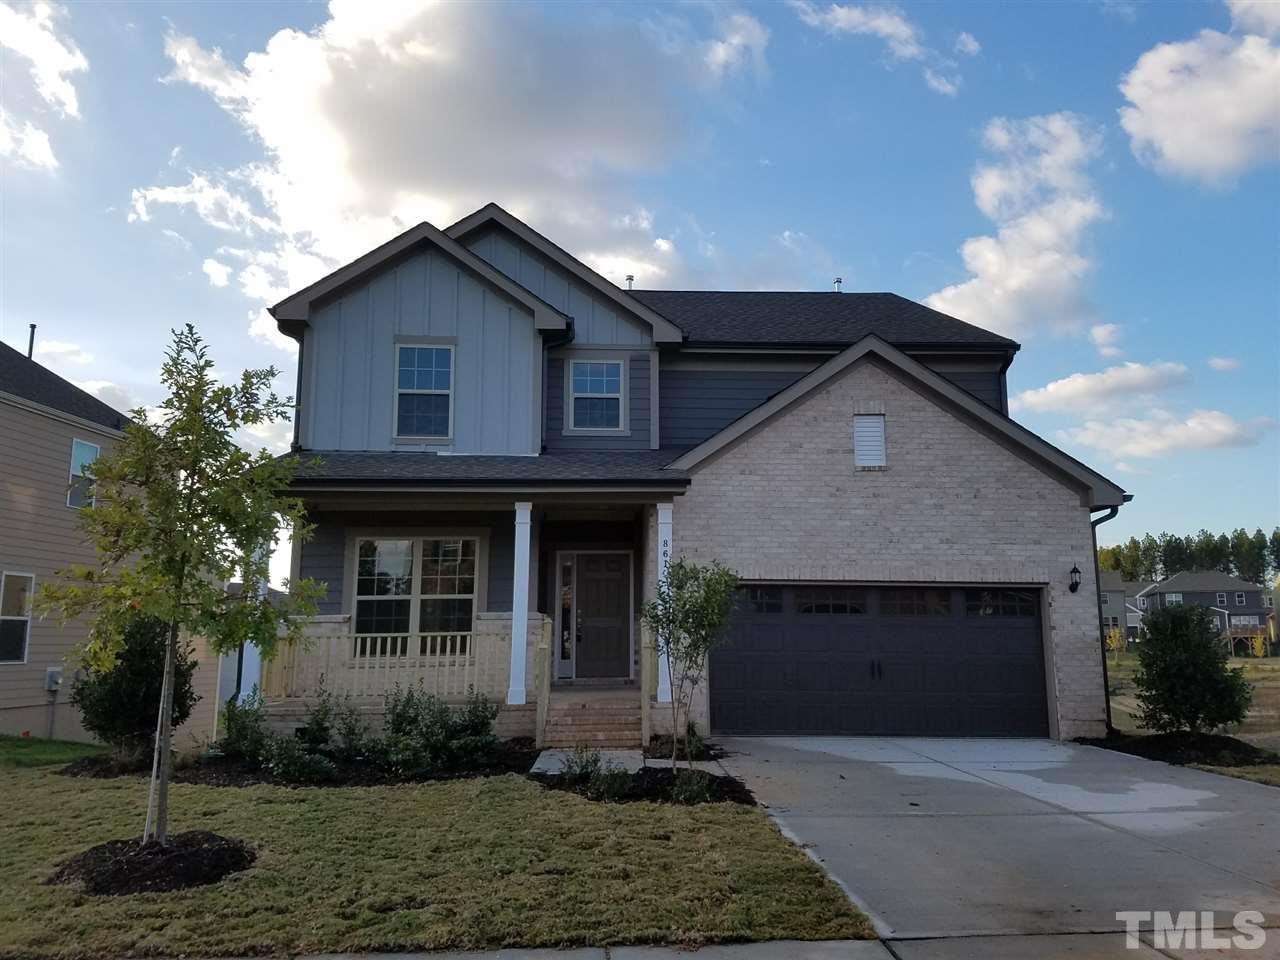 861 Cozy Oak Avenue OSFS Lot 89, Cary, NC 27519